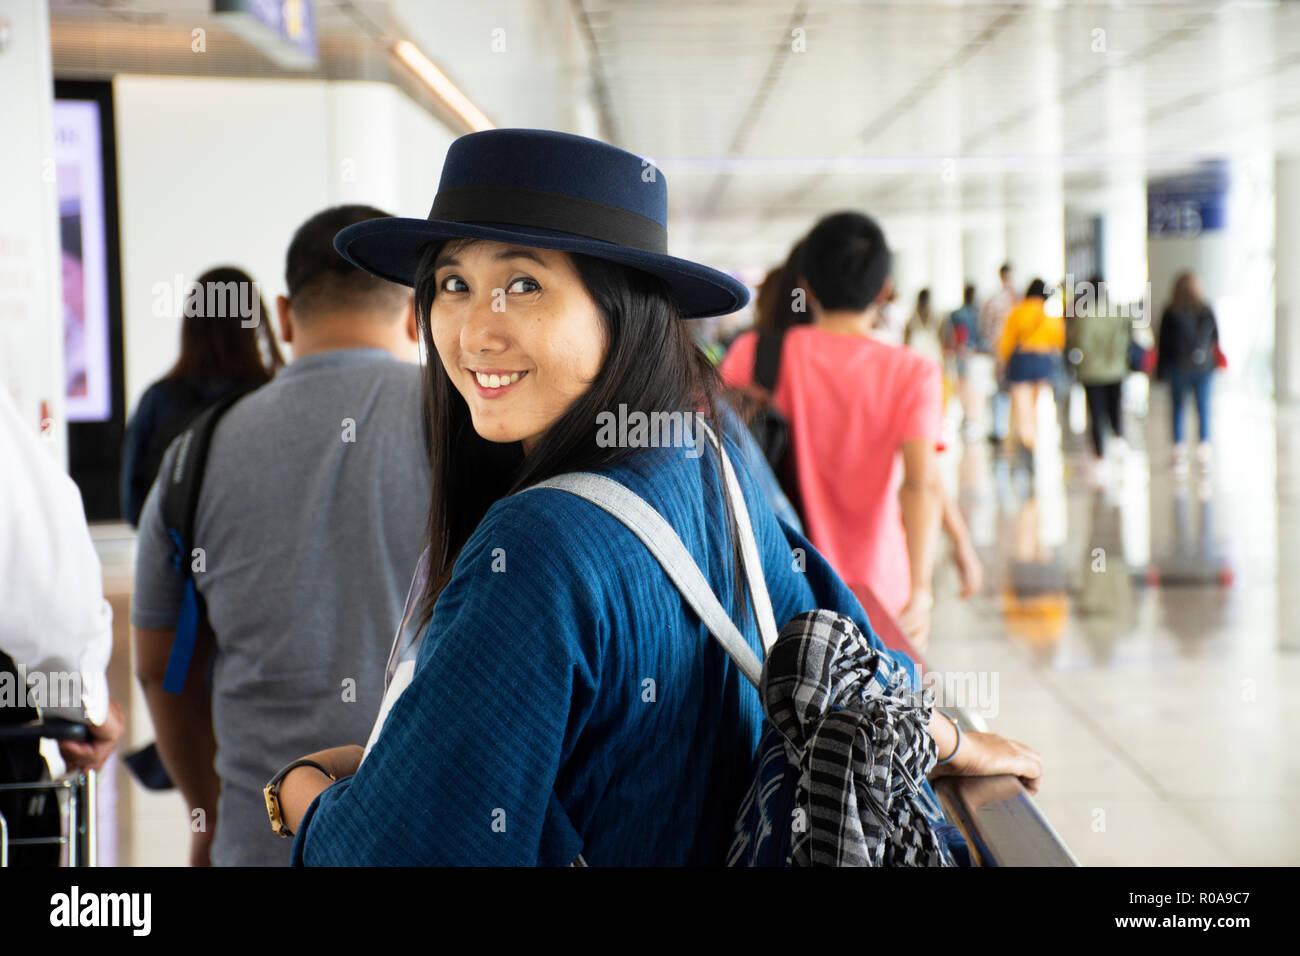 Travelers thai woman walking in terminal go to bus station at Hong Kong International Airport or Chek Lap Kok Airport on September 3, 2018 in Hong Kon - Stock Image